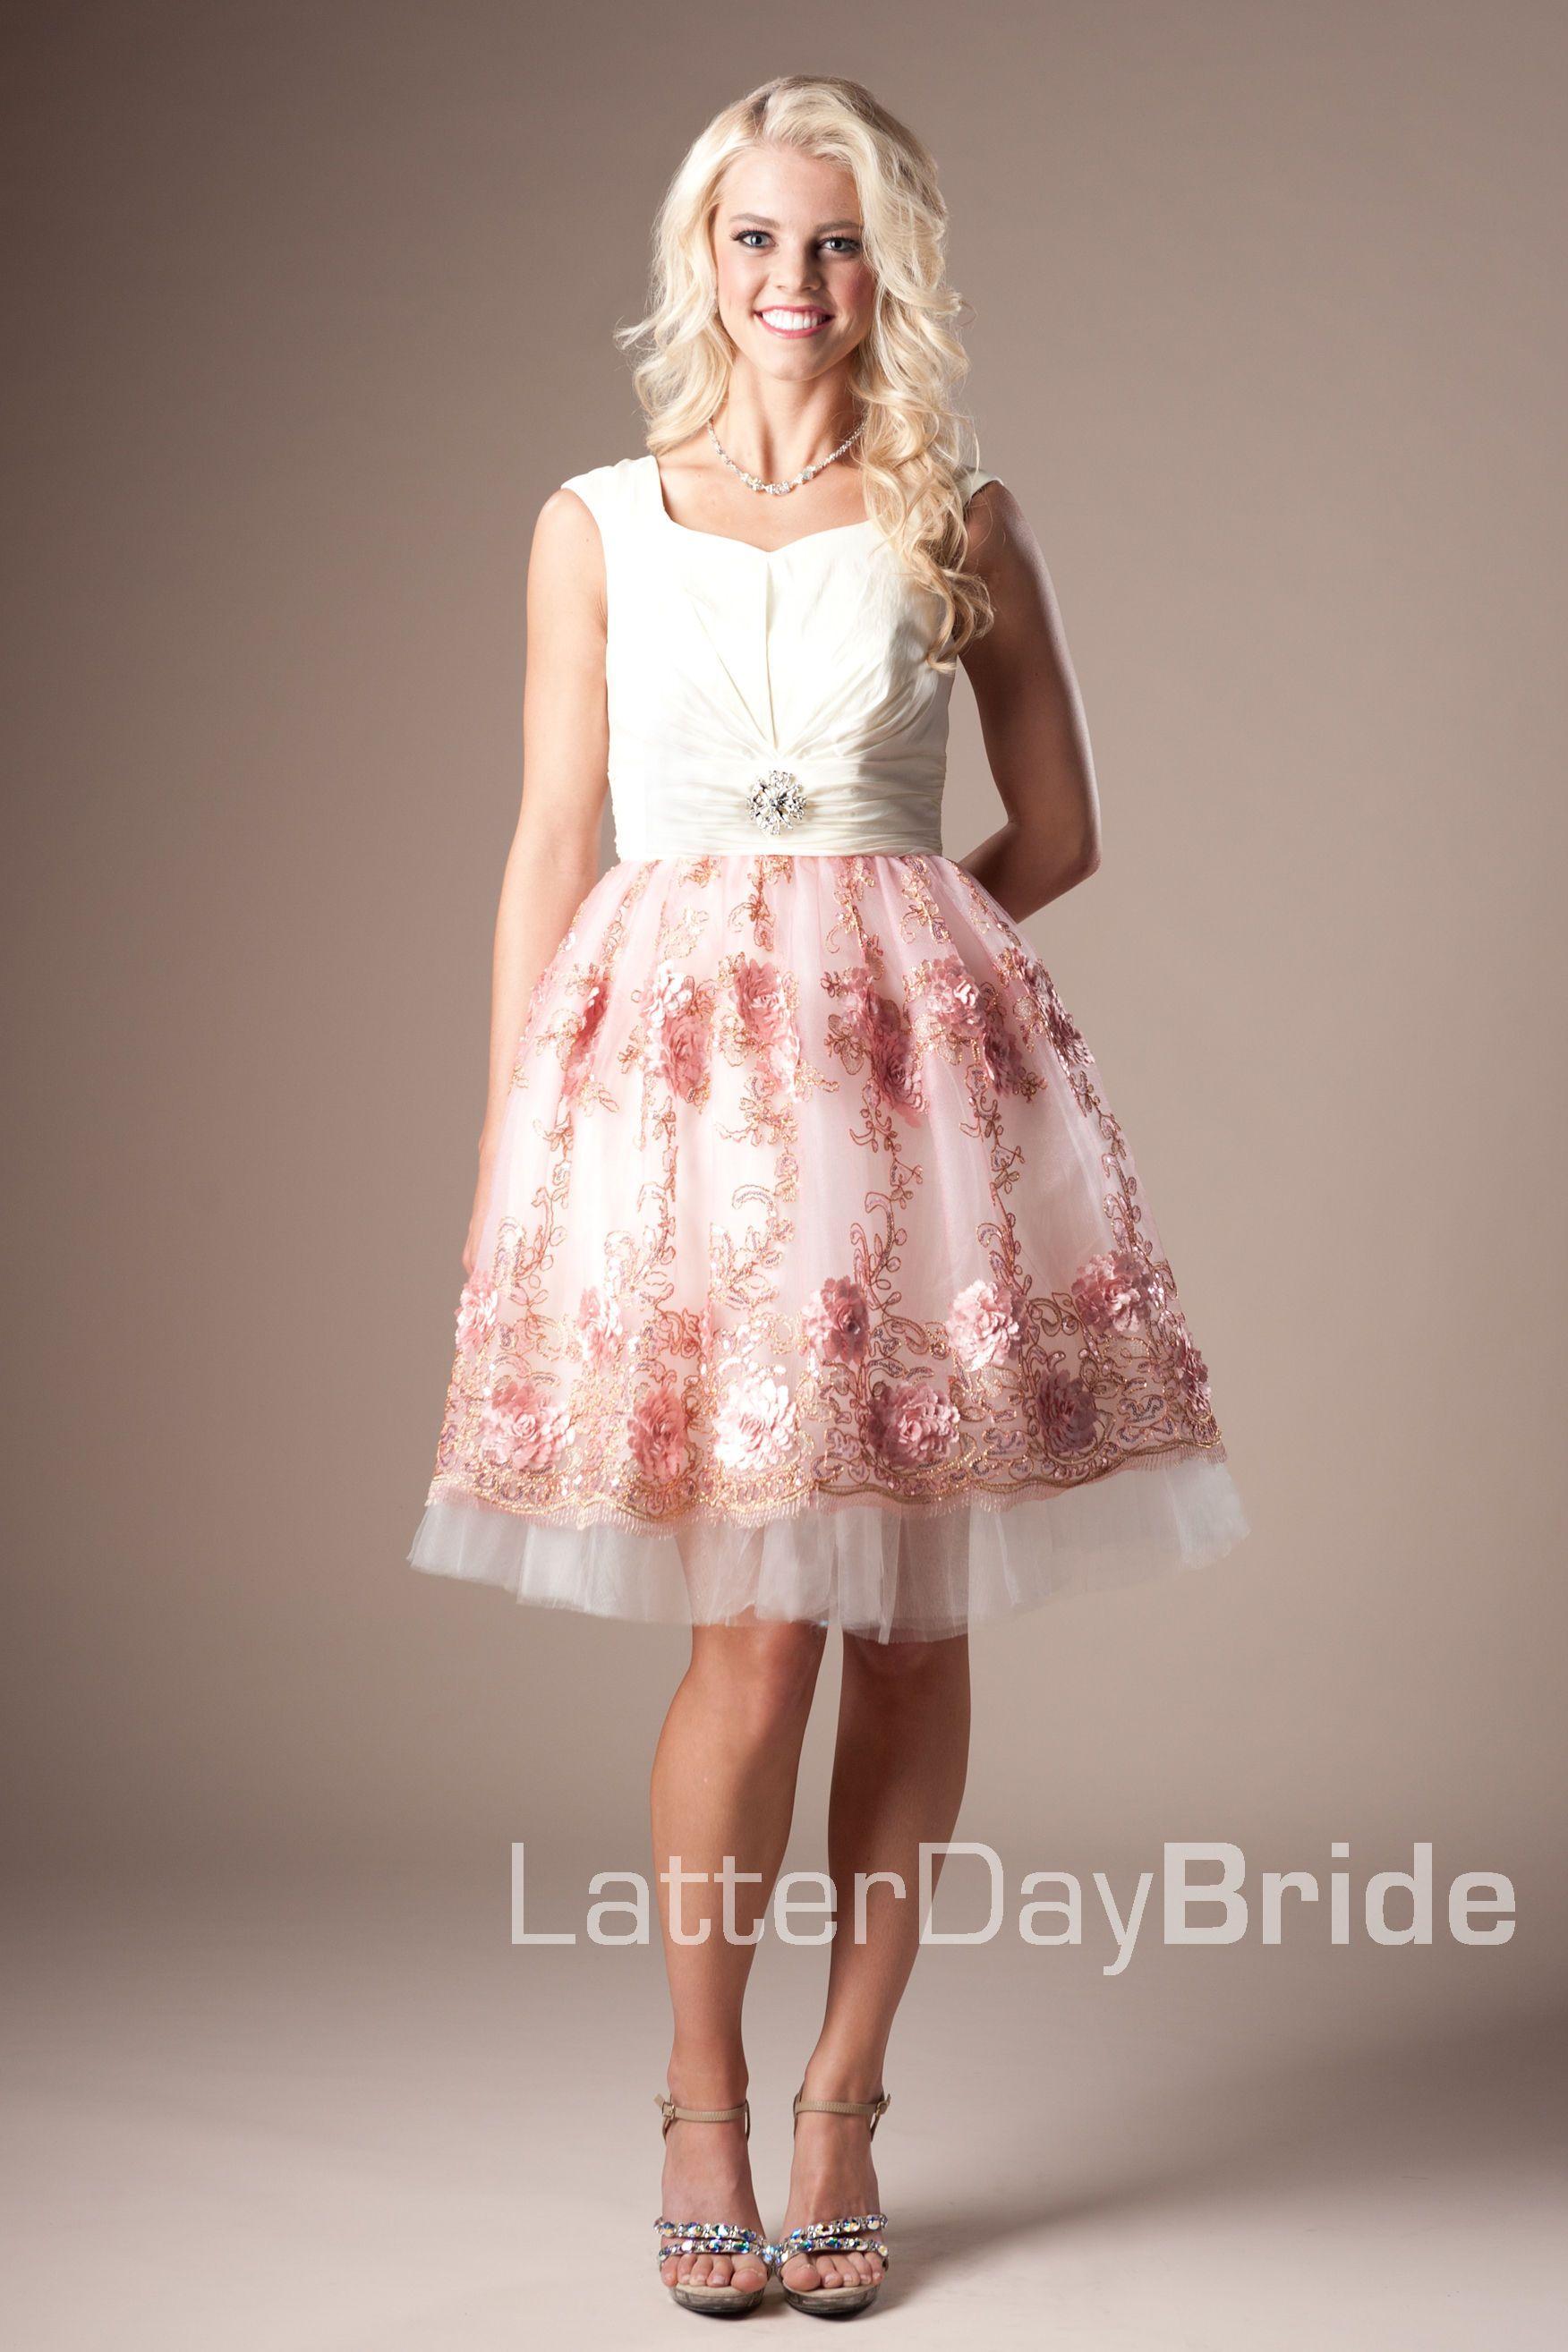 Bridesmaid & Prom, Nora | LatterDayBride & Prom | Shopaholic | Pinterest